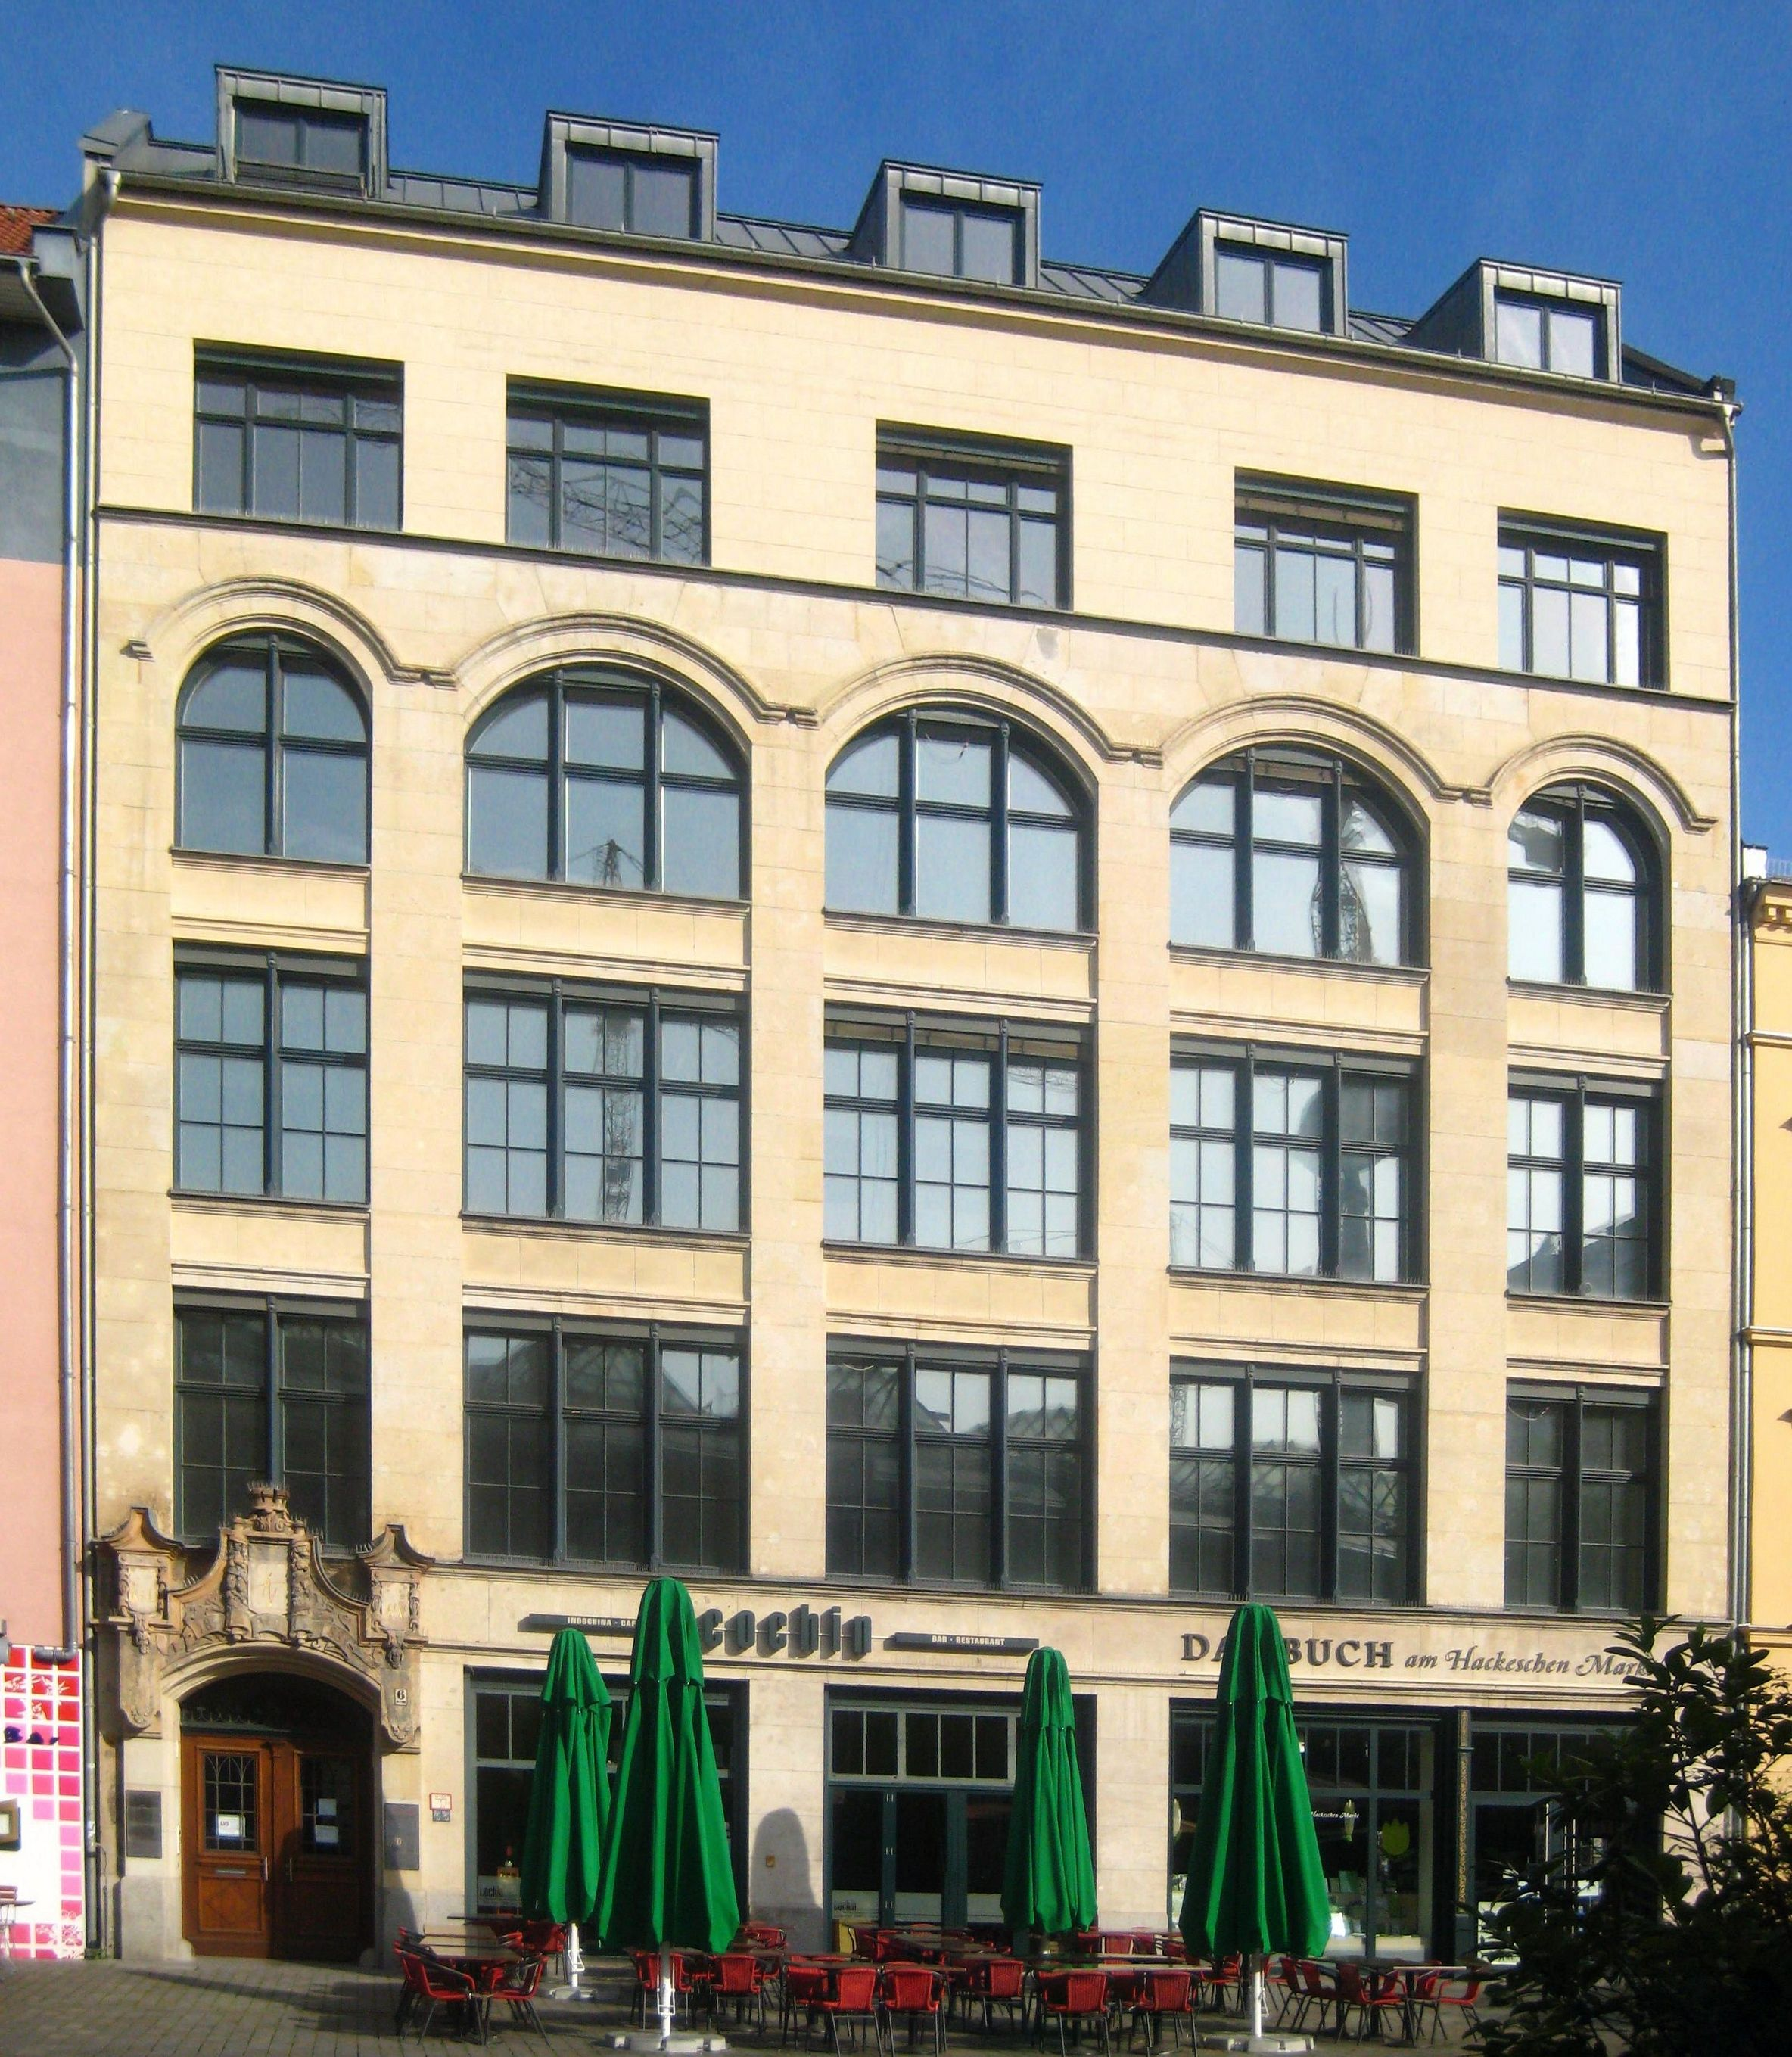 Fileberlin mitte neue promenade 6 geschaeftshaus jpg wikimedia